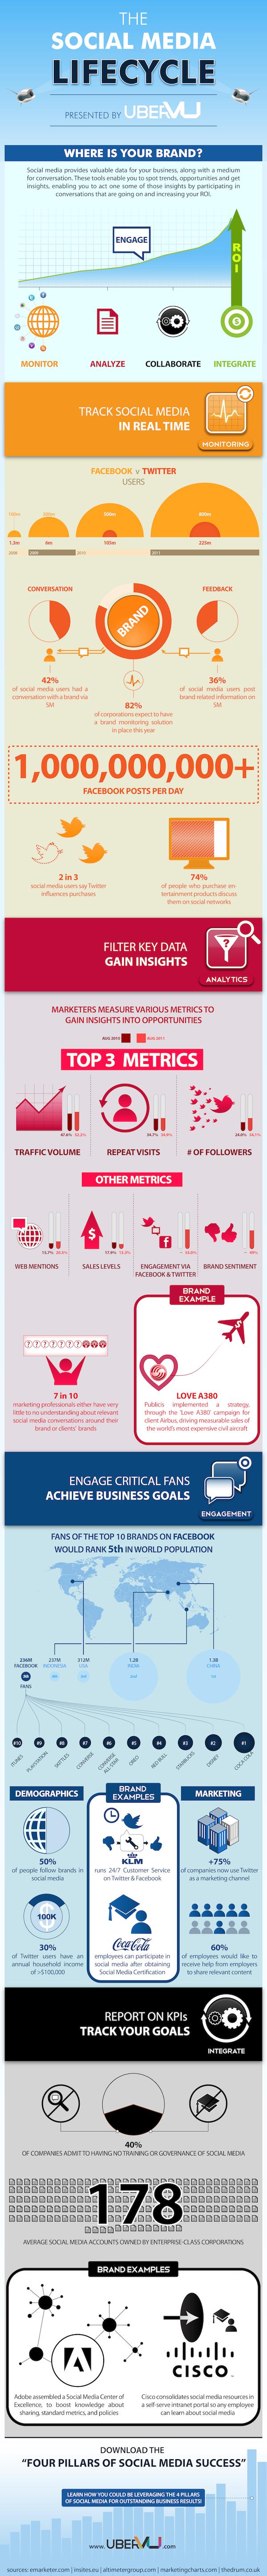 Social Media Life Cycle (Click to enlarge)